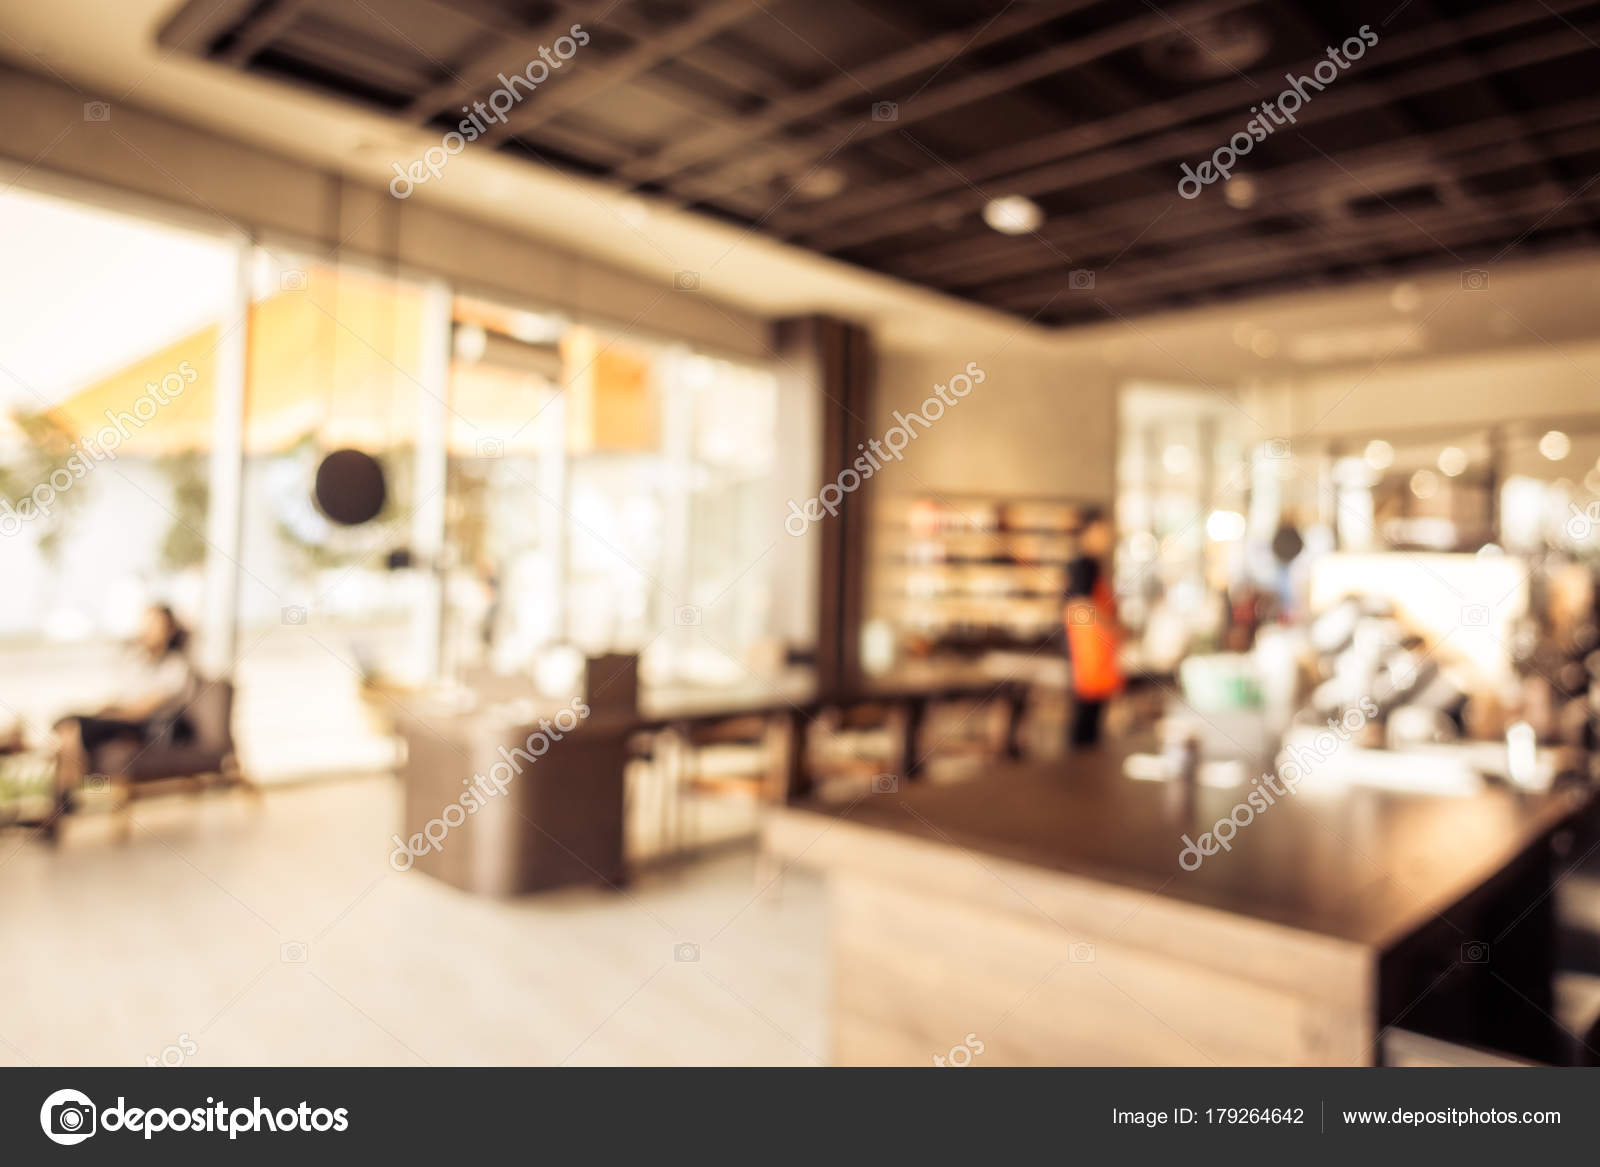 Abstract Blur Coffee Shop Cafe Restaurant Interior Background Vintage Filter Stock Photo C Mrsiraphol 179264642